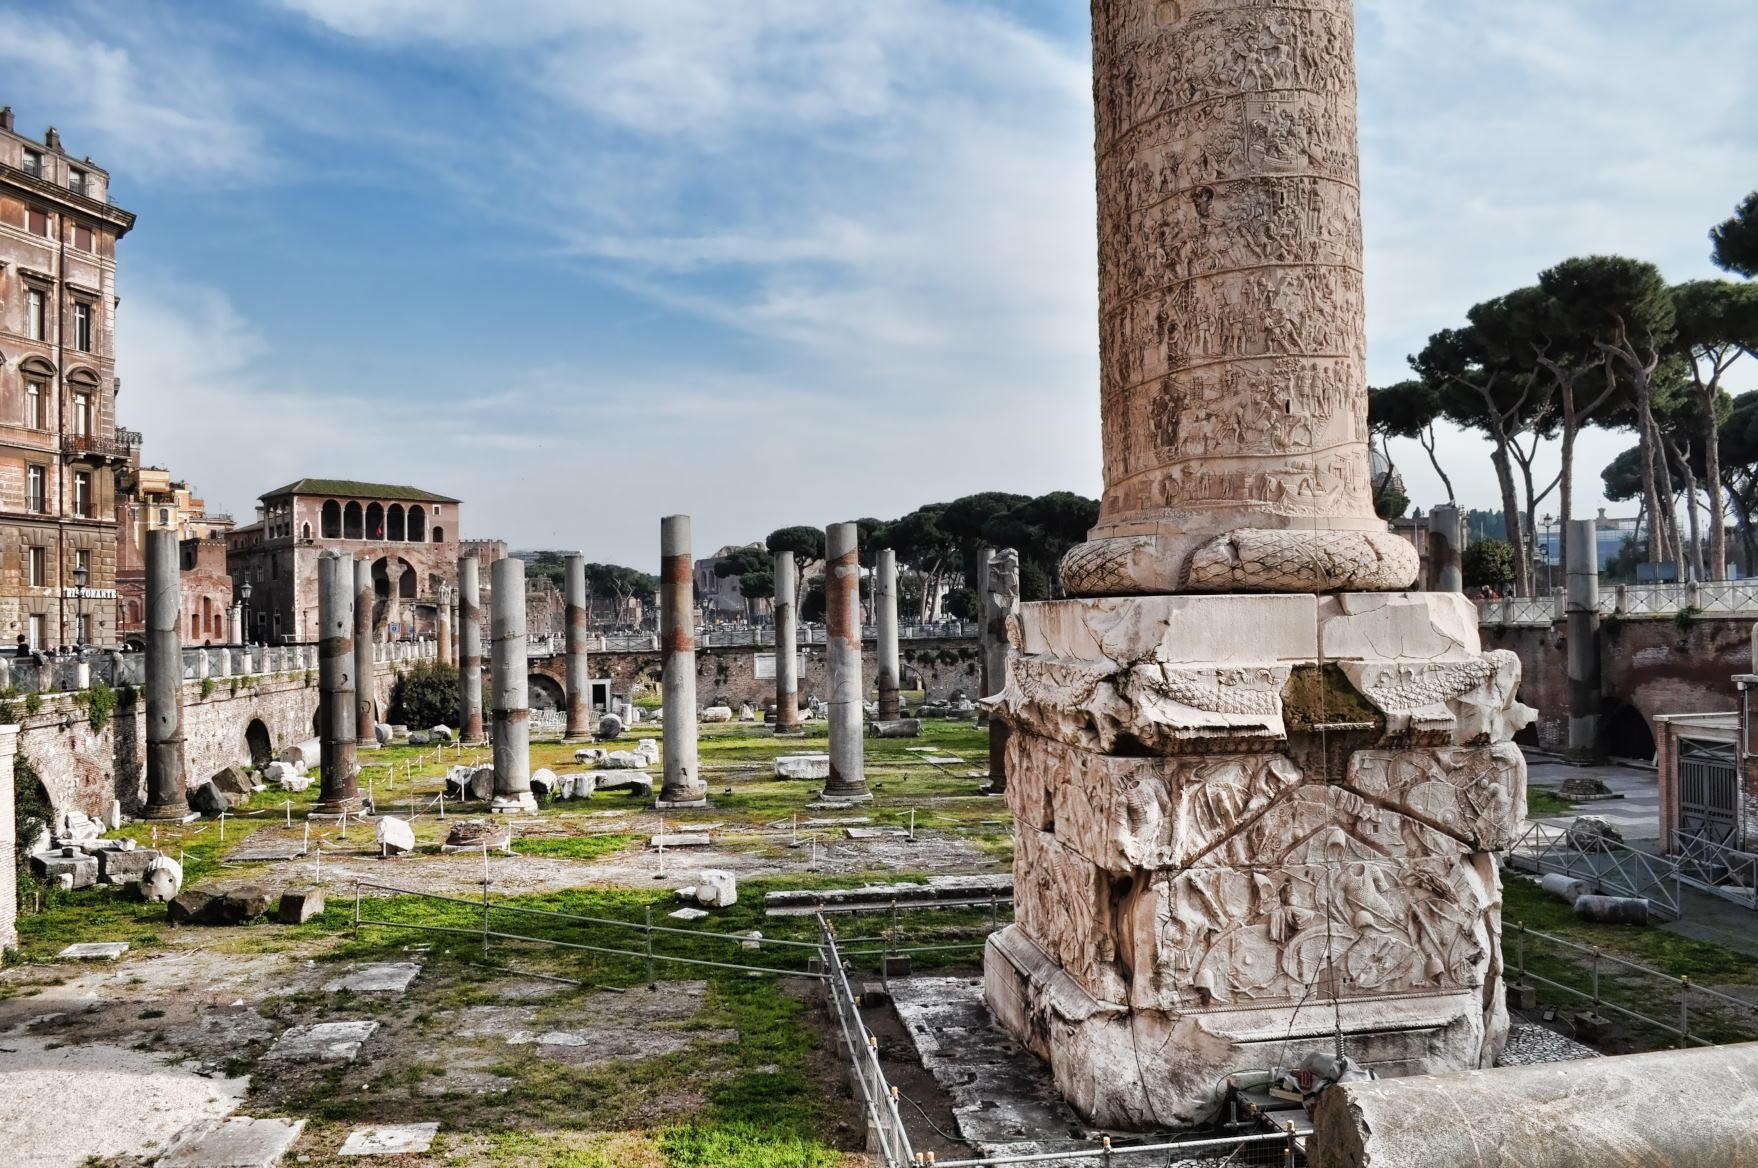 Trajan's Column a Roman triumphal column in Rome, Italy